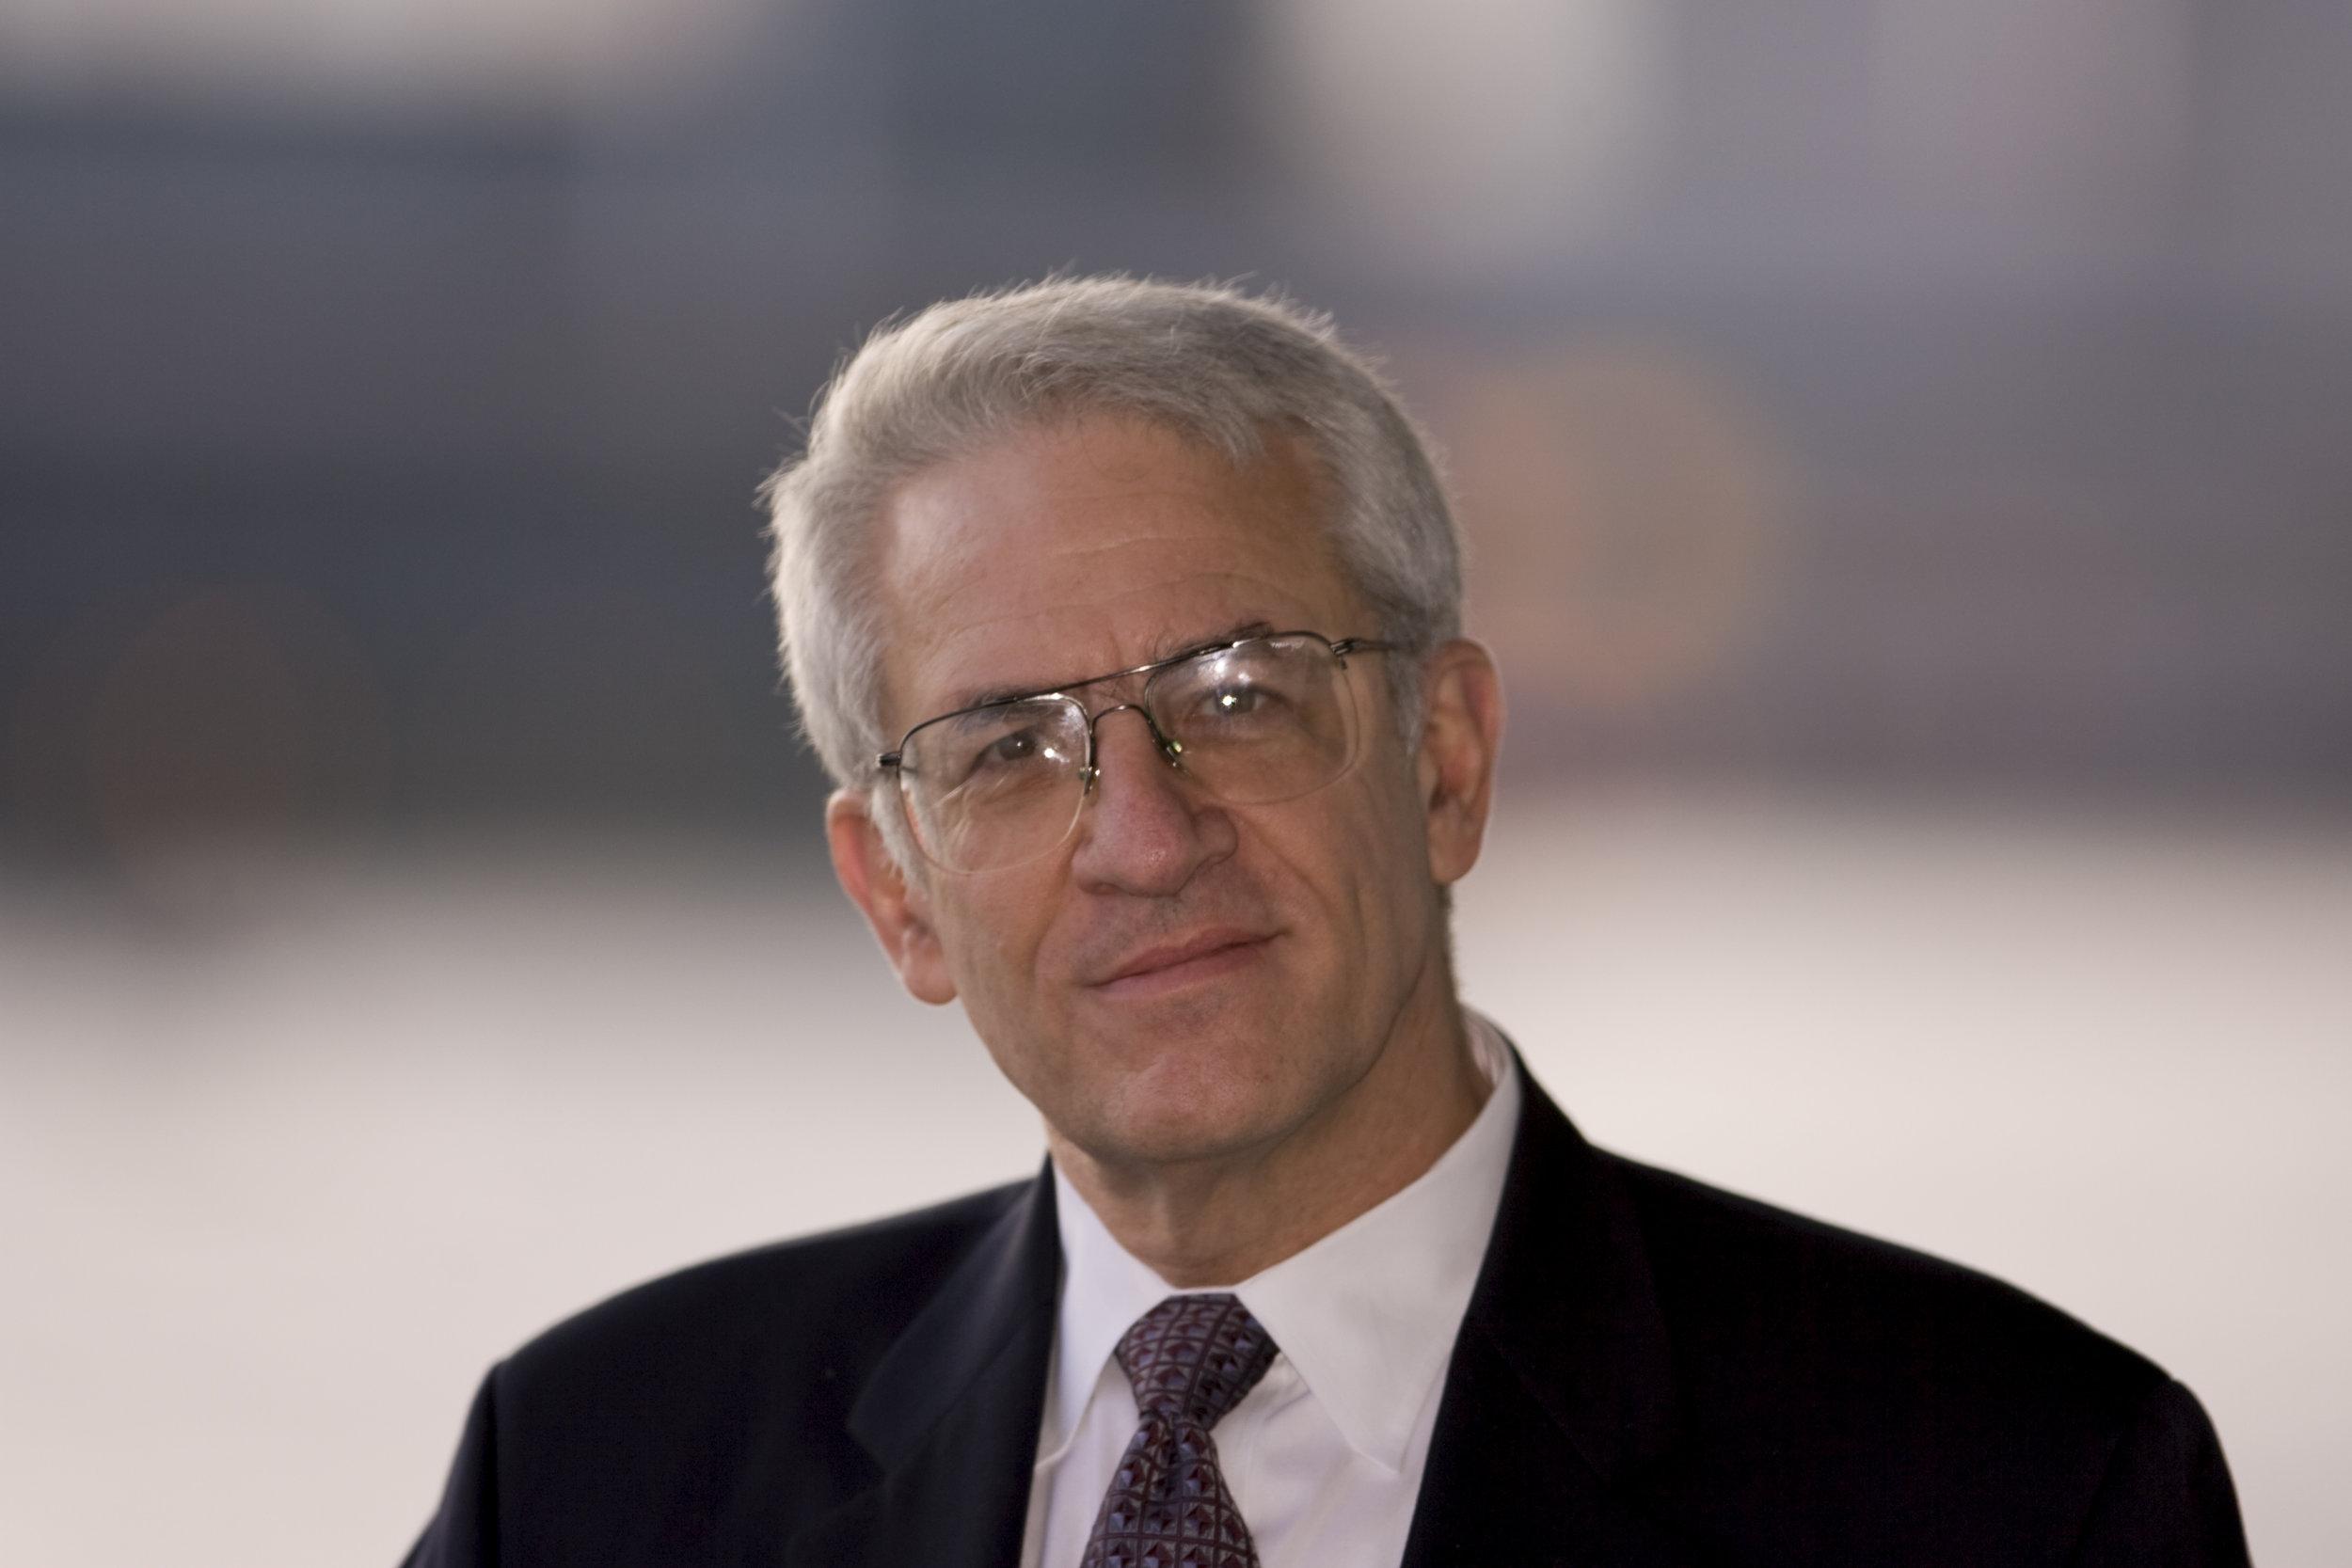 SANS Founder Alan Paller